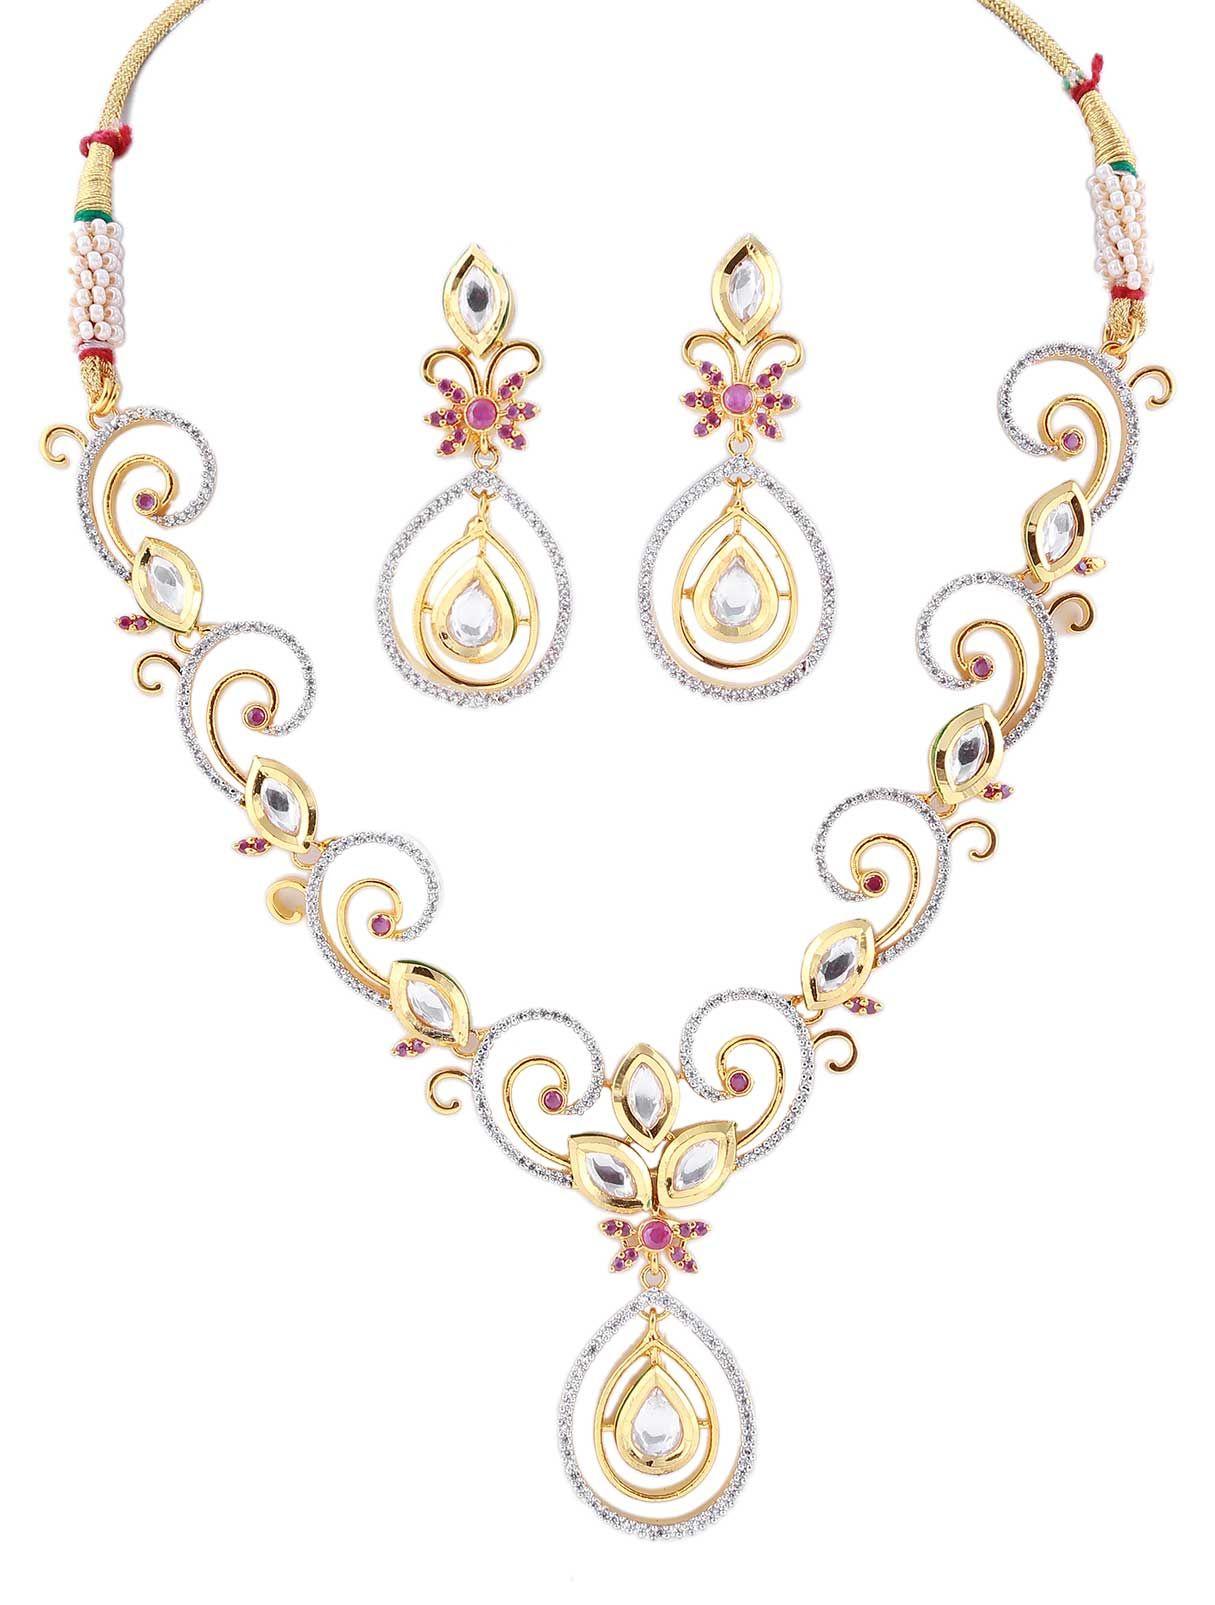 CZ Necklace Jewelry Set with Kundan Stones